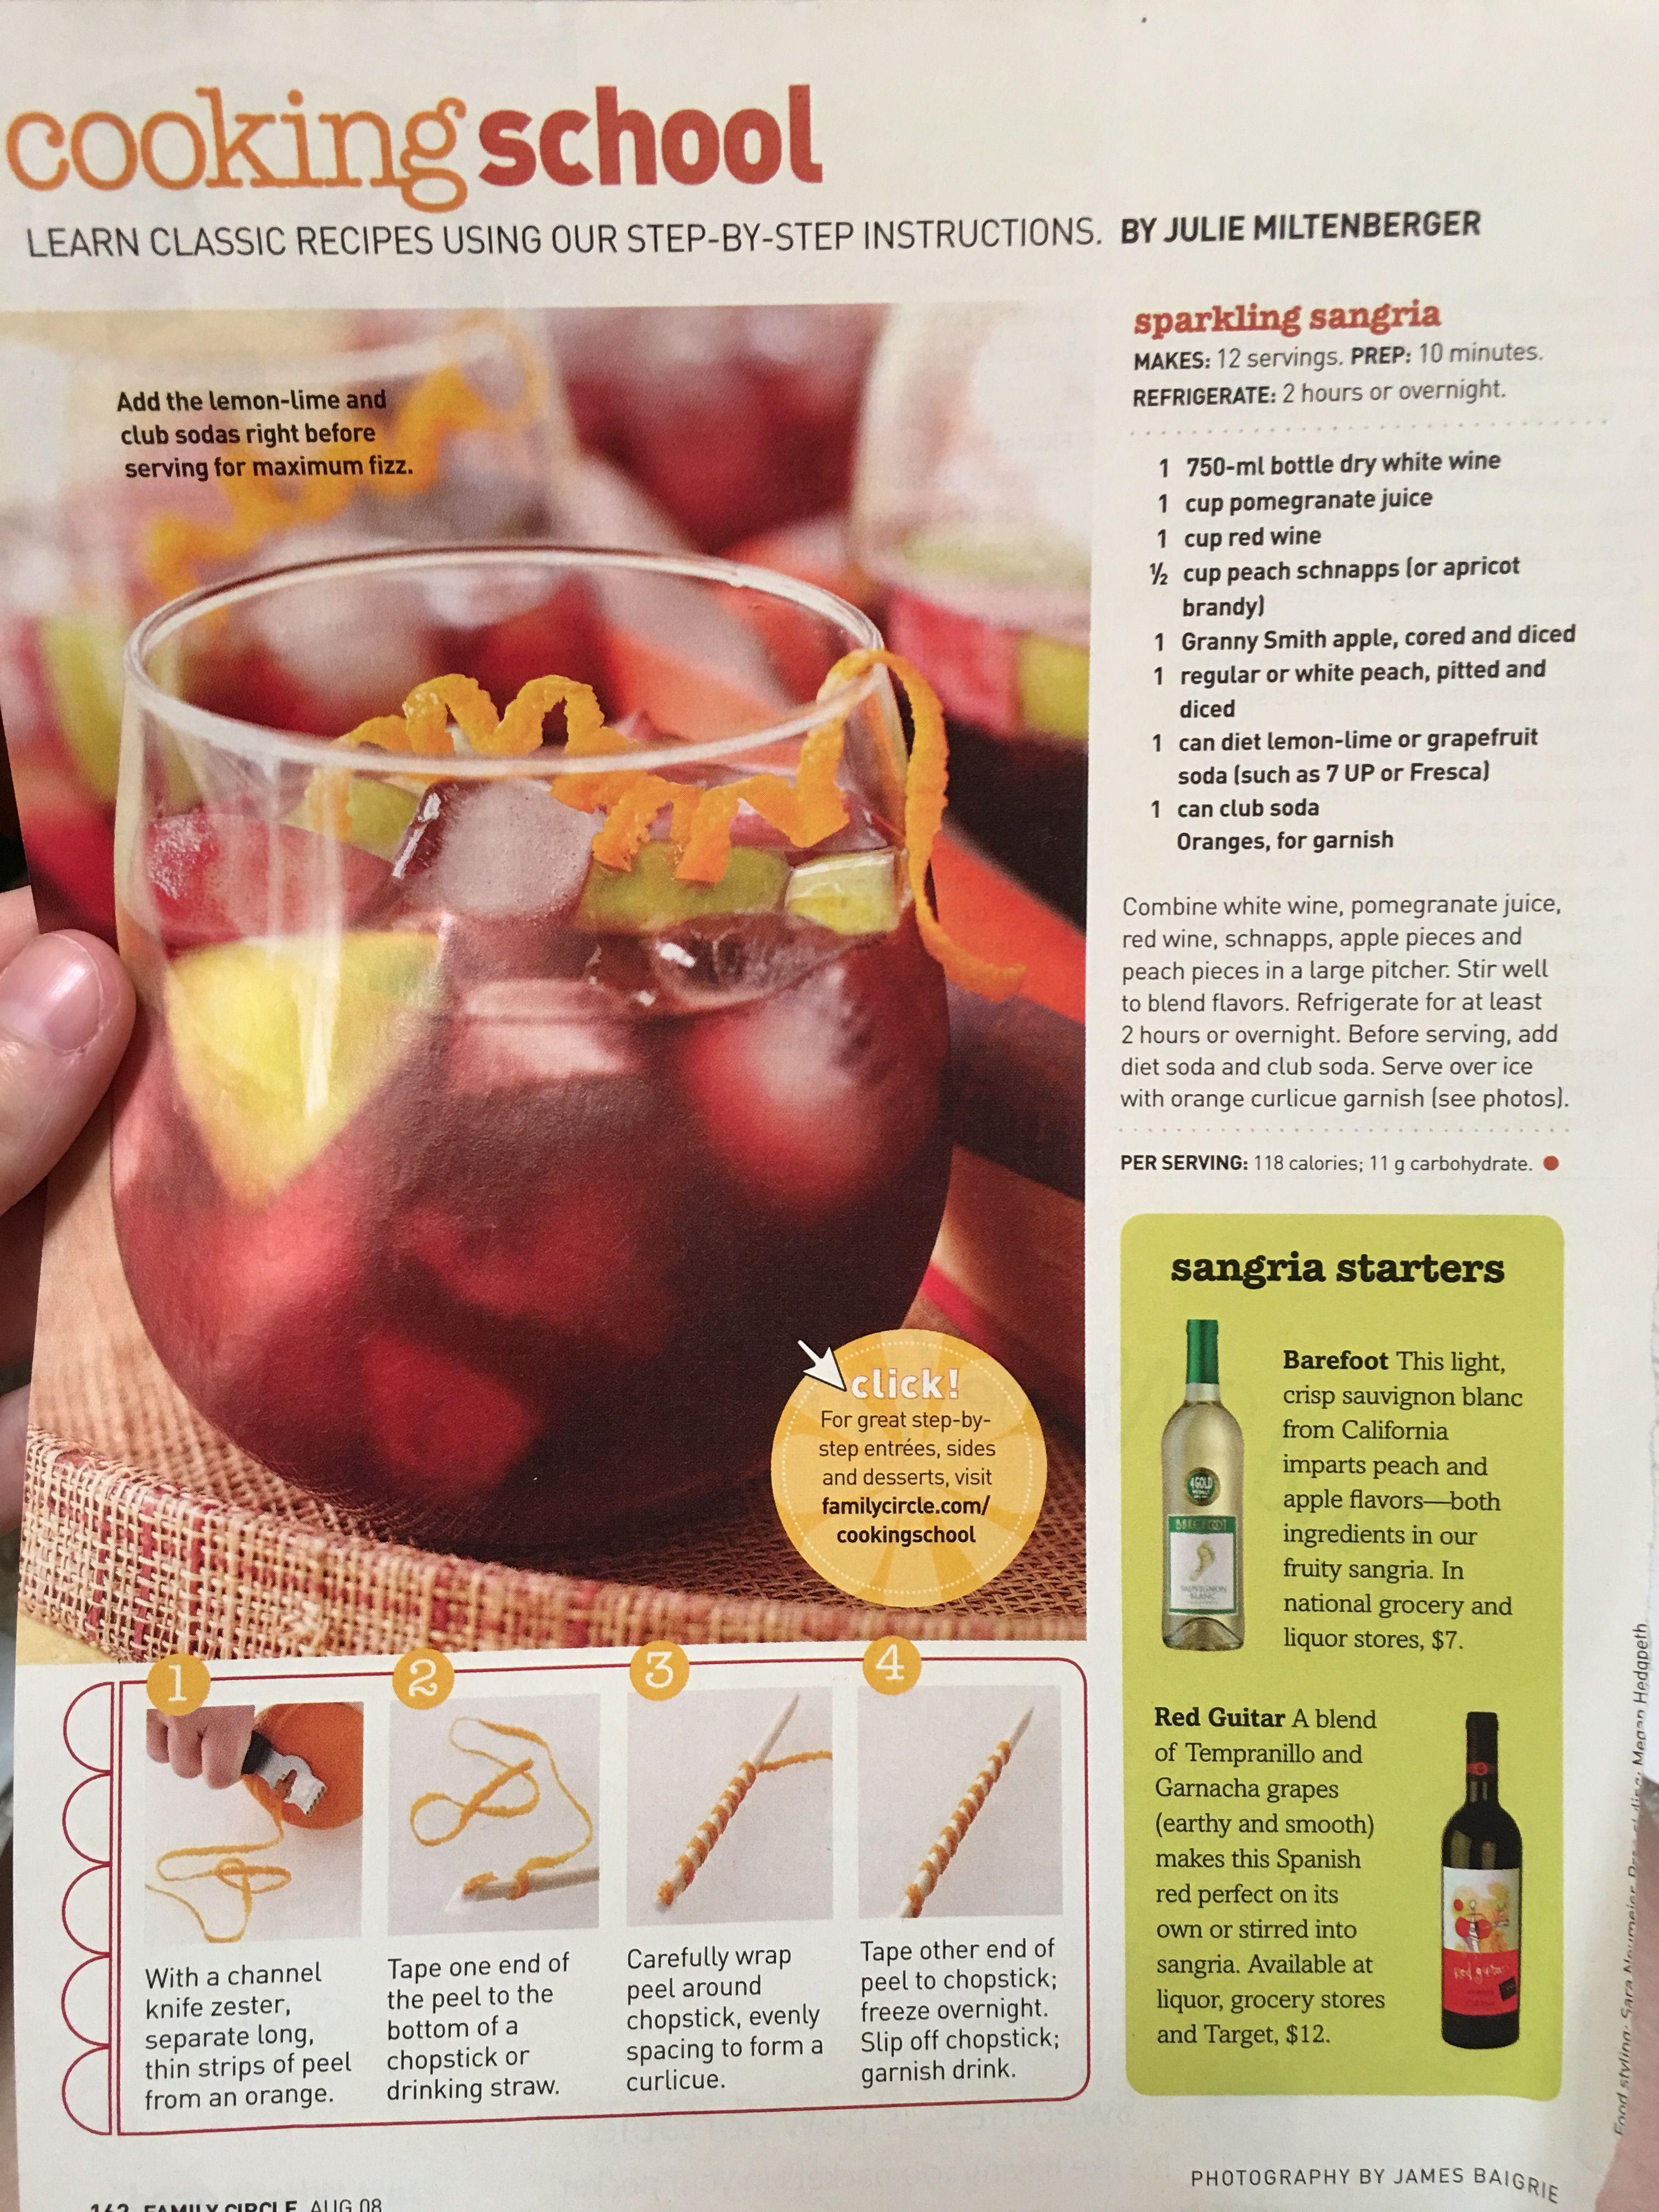 Sparkling Sangria Sparkling Sangria White Wine Cups Classic Food